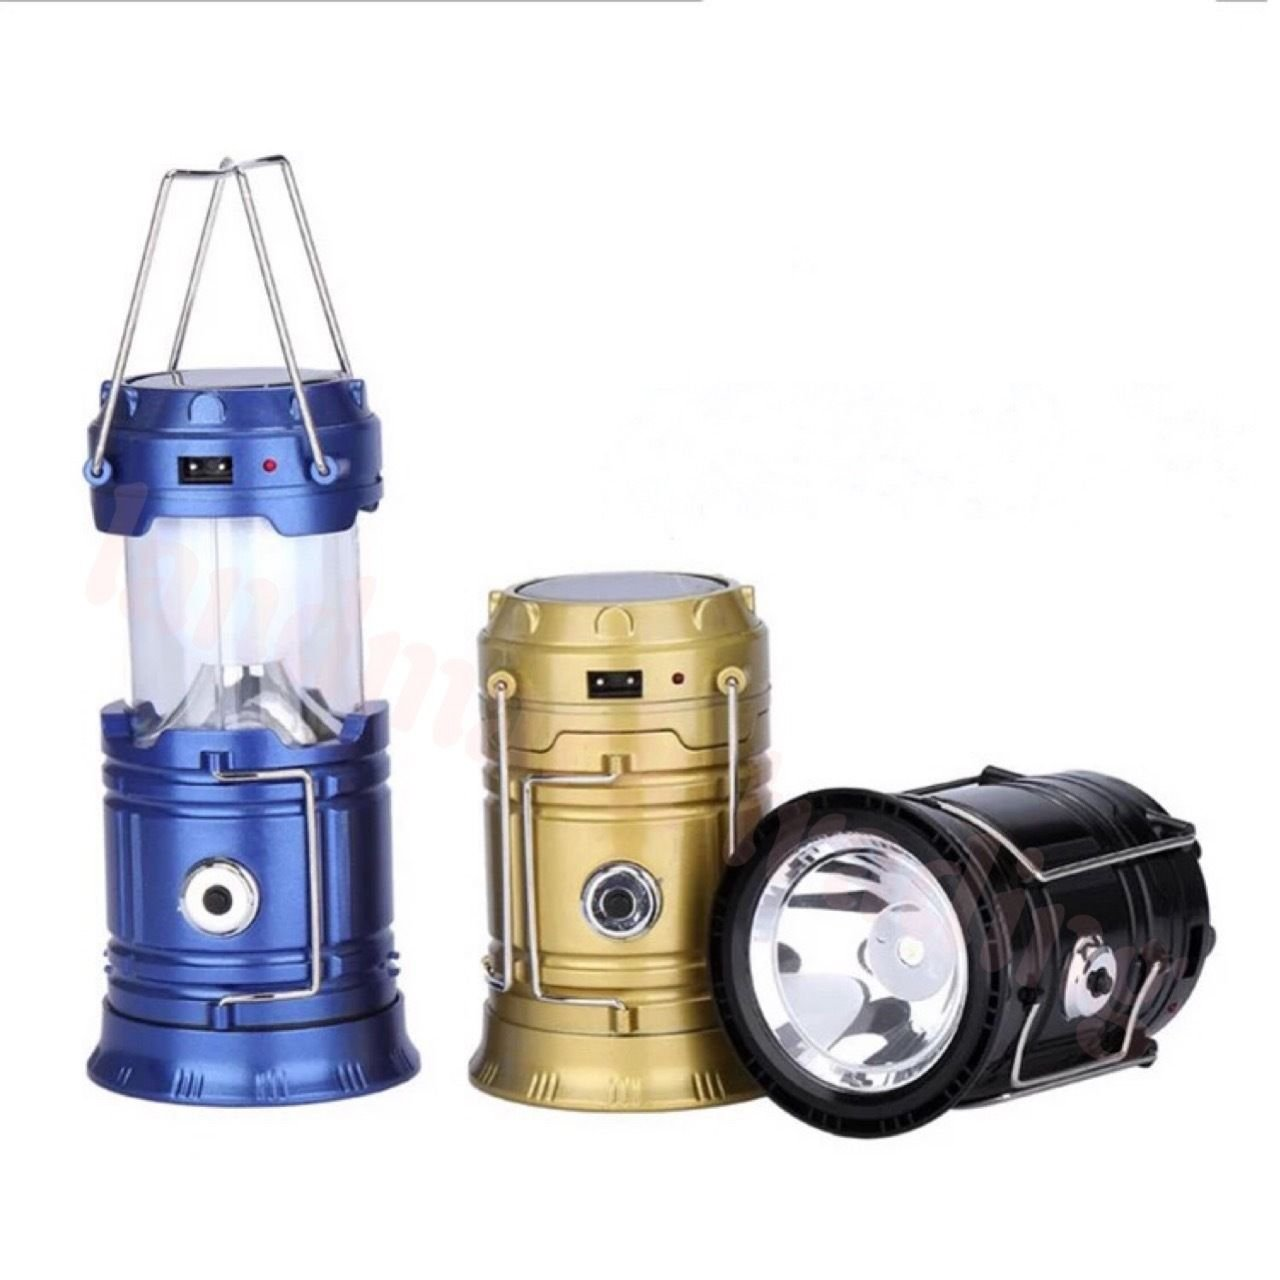 Buy Royals Senbei XF 5800T 6 + 1 LED Solar Emergency Light Lantern ...